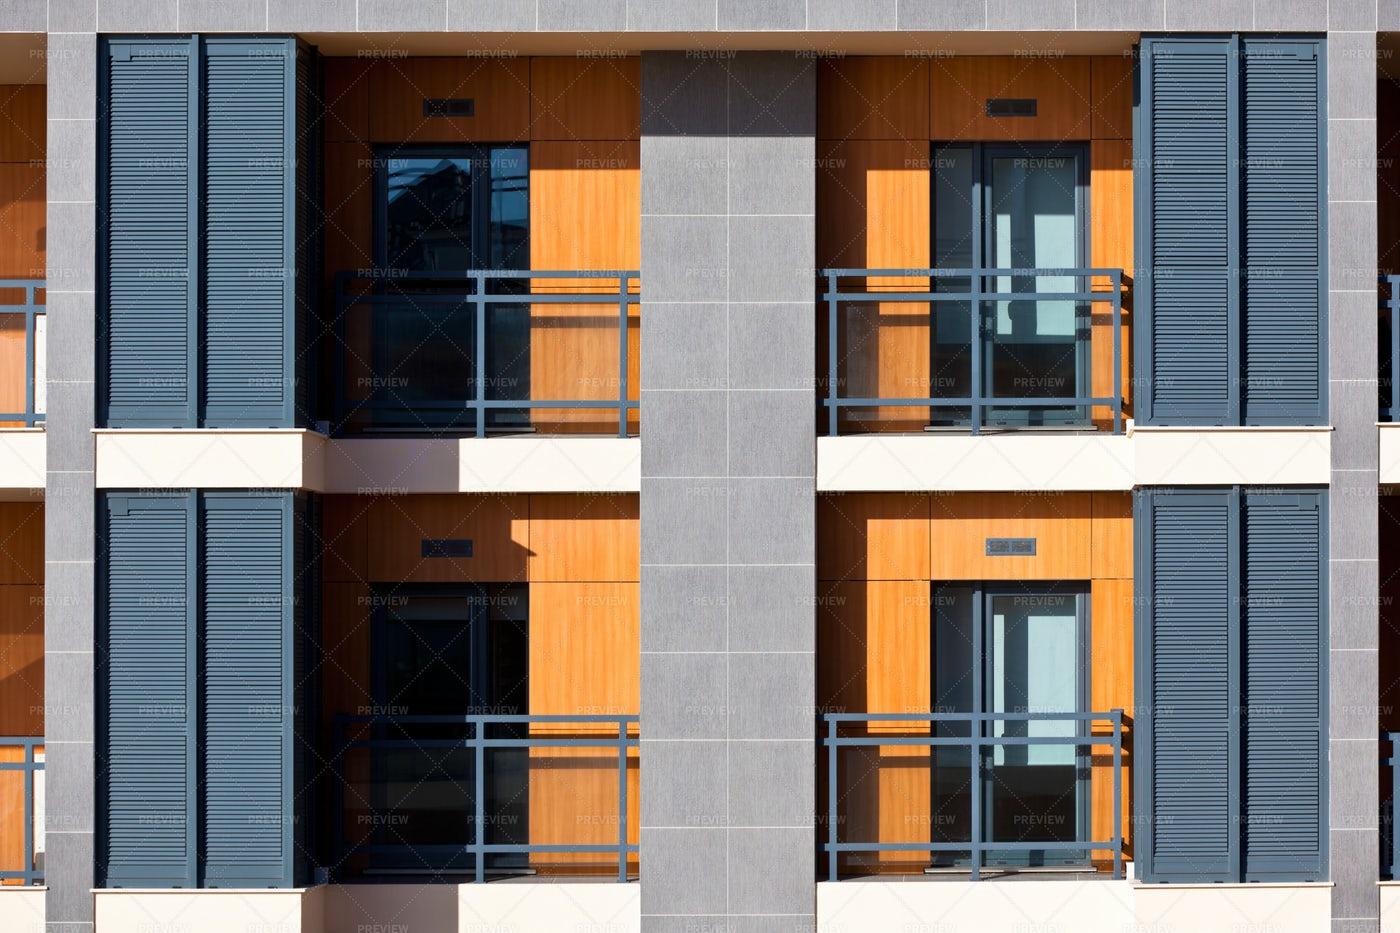 Modern Apartment Building: Stock Photos